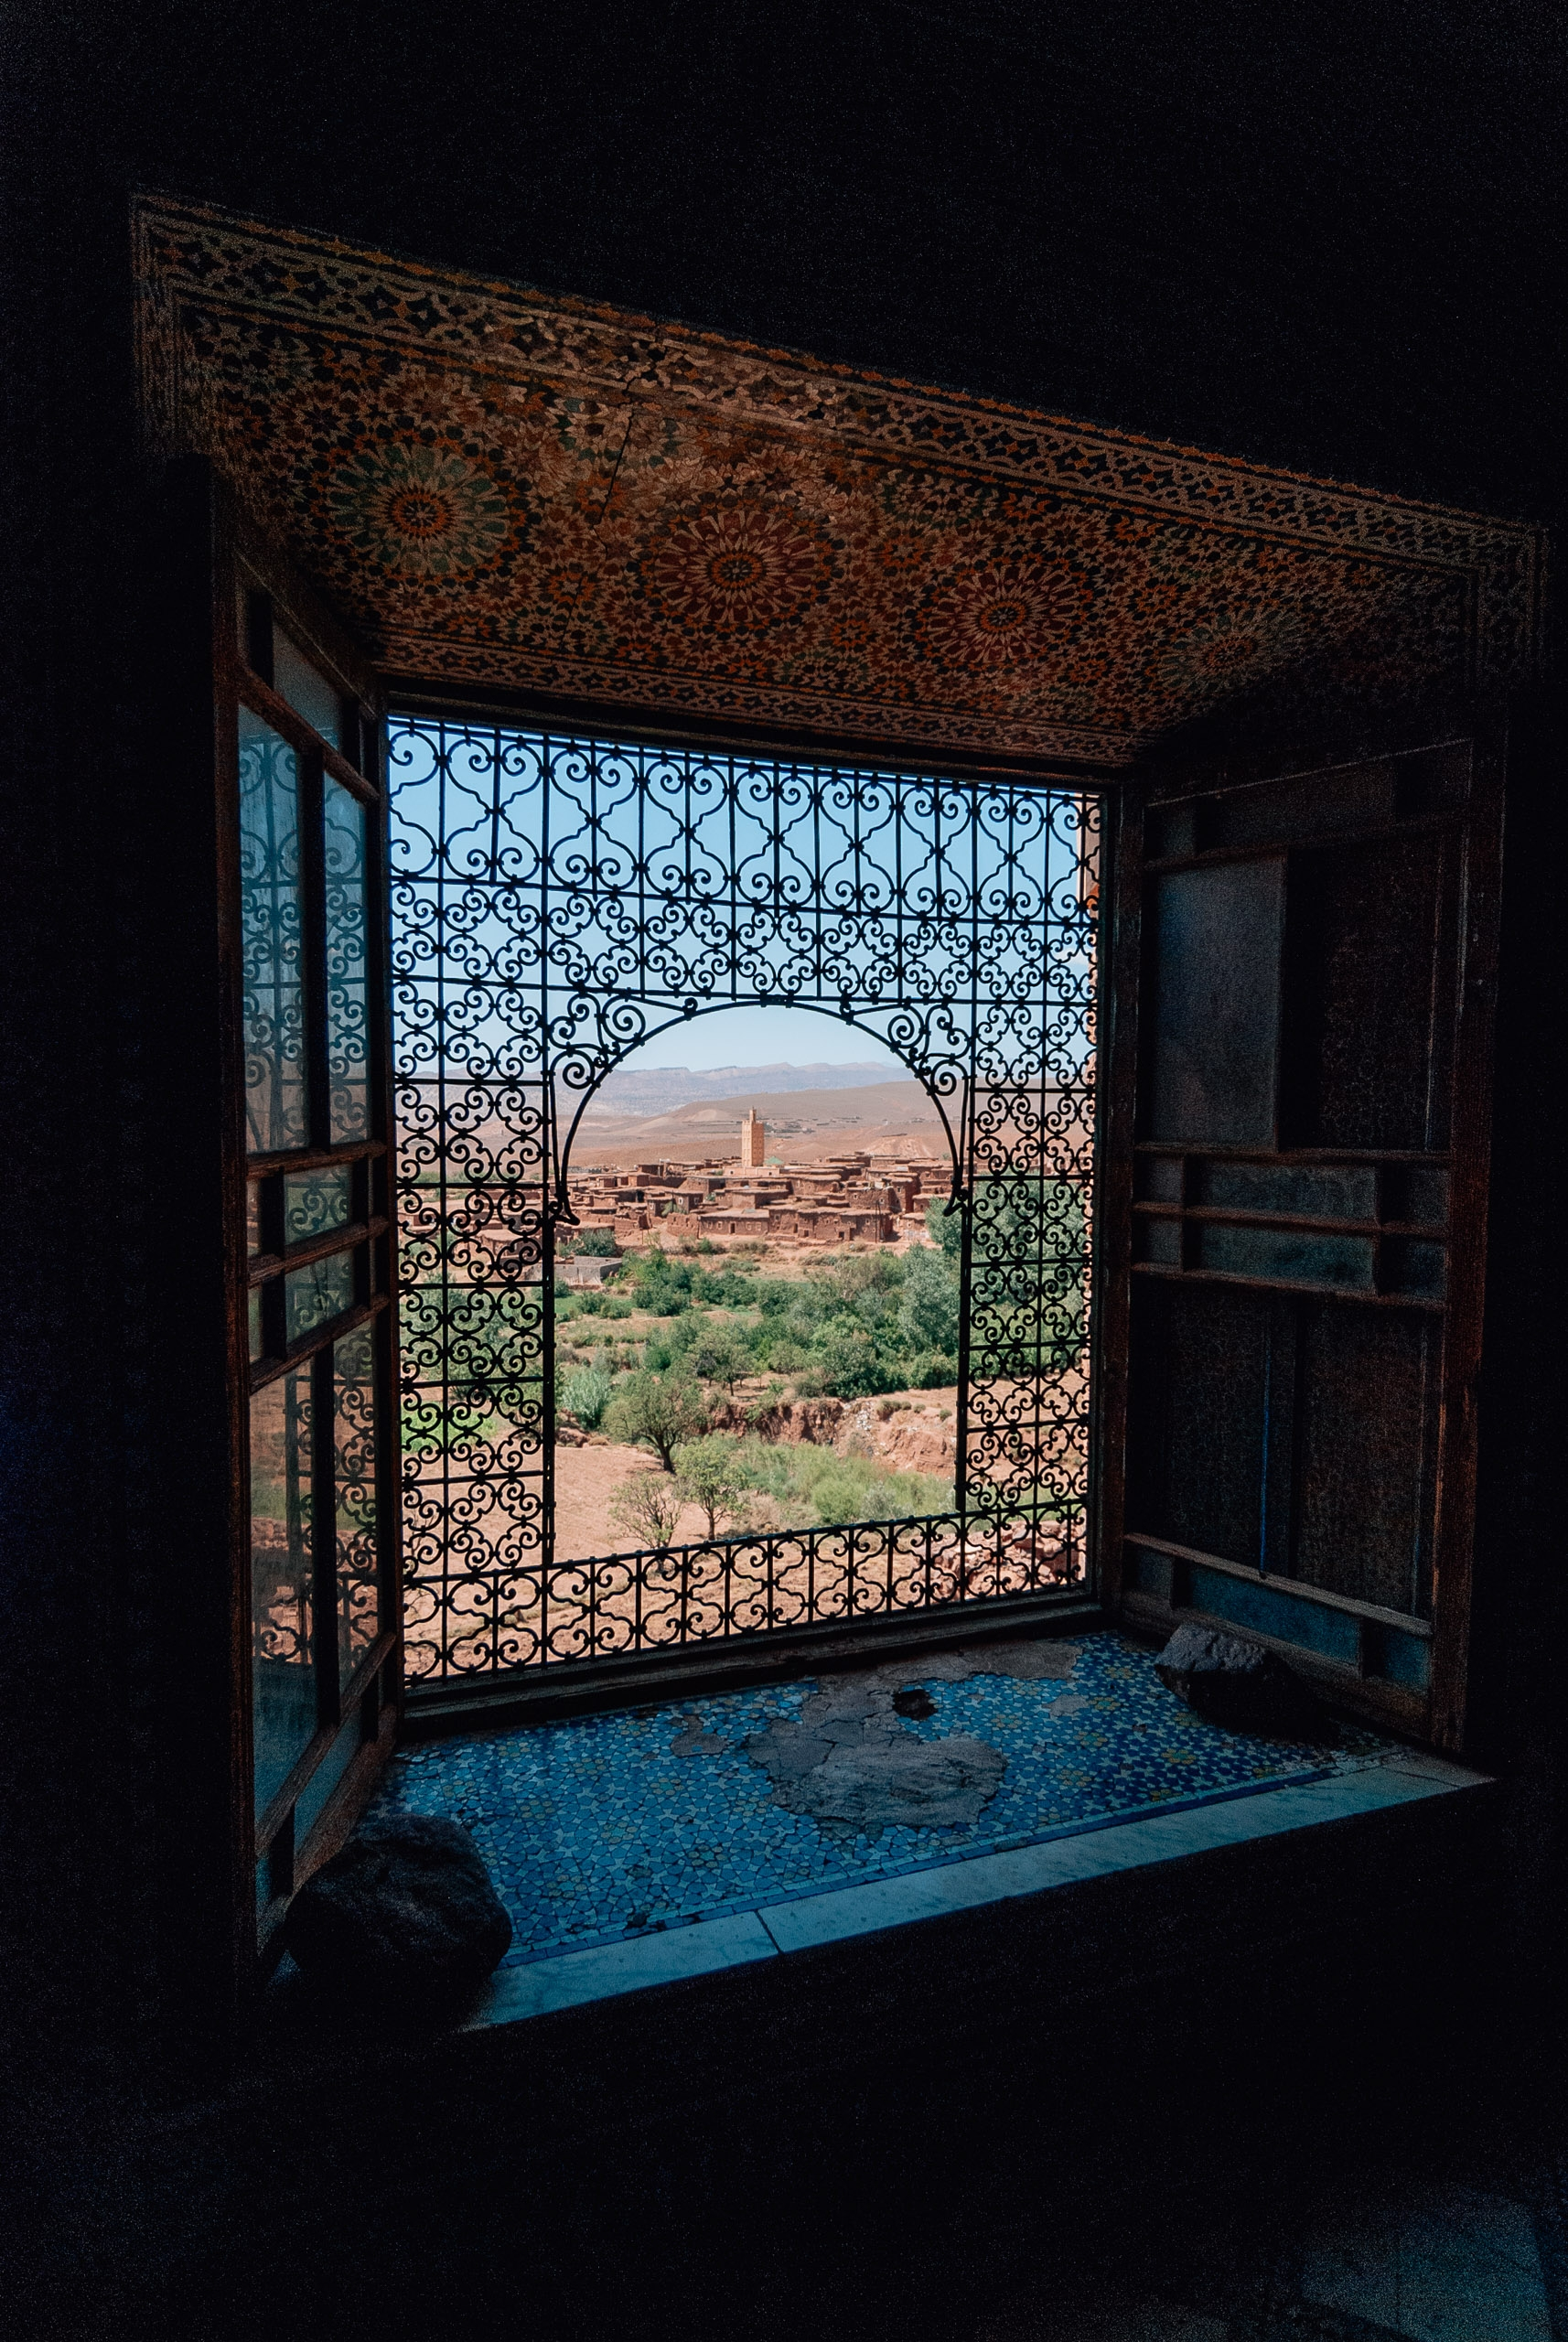 Morocco - 2008-0906-DSC_0028_61850